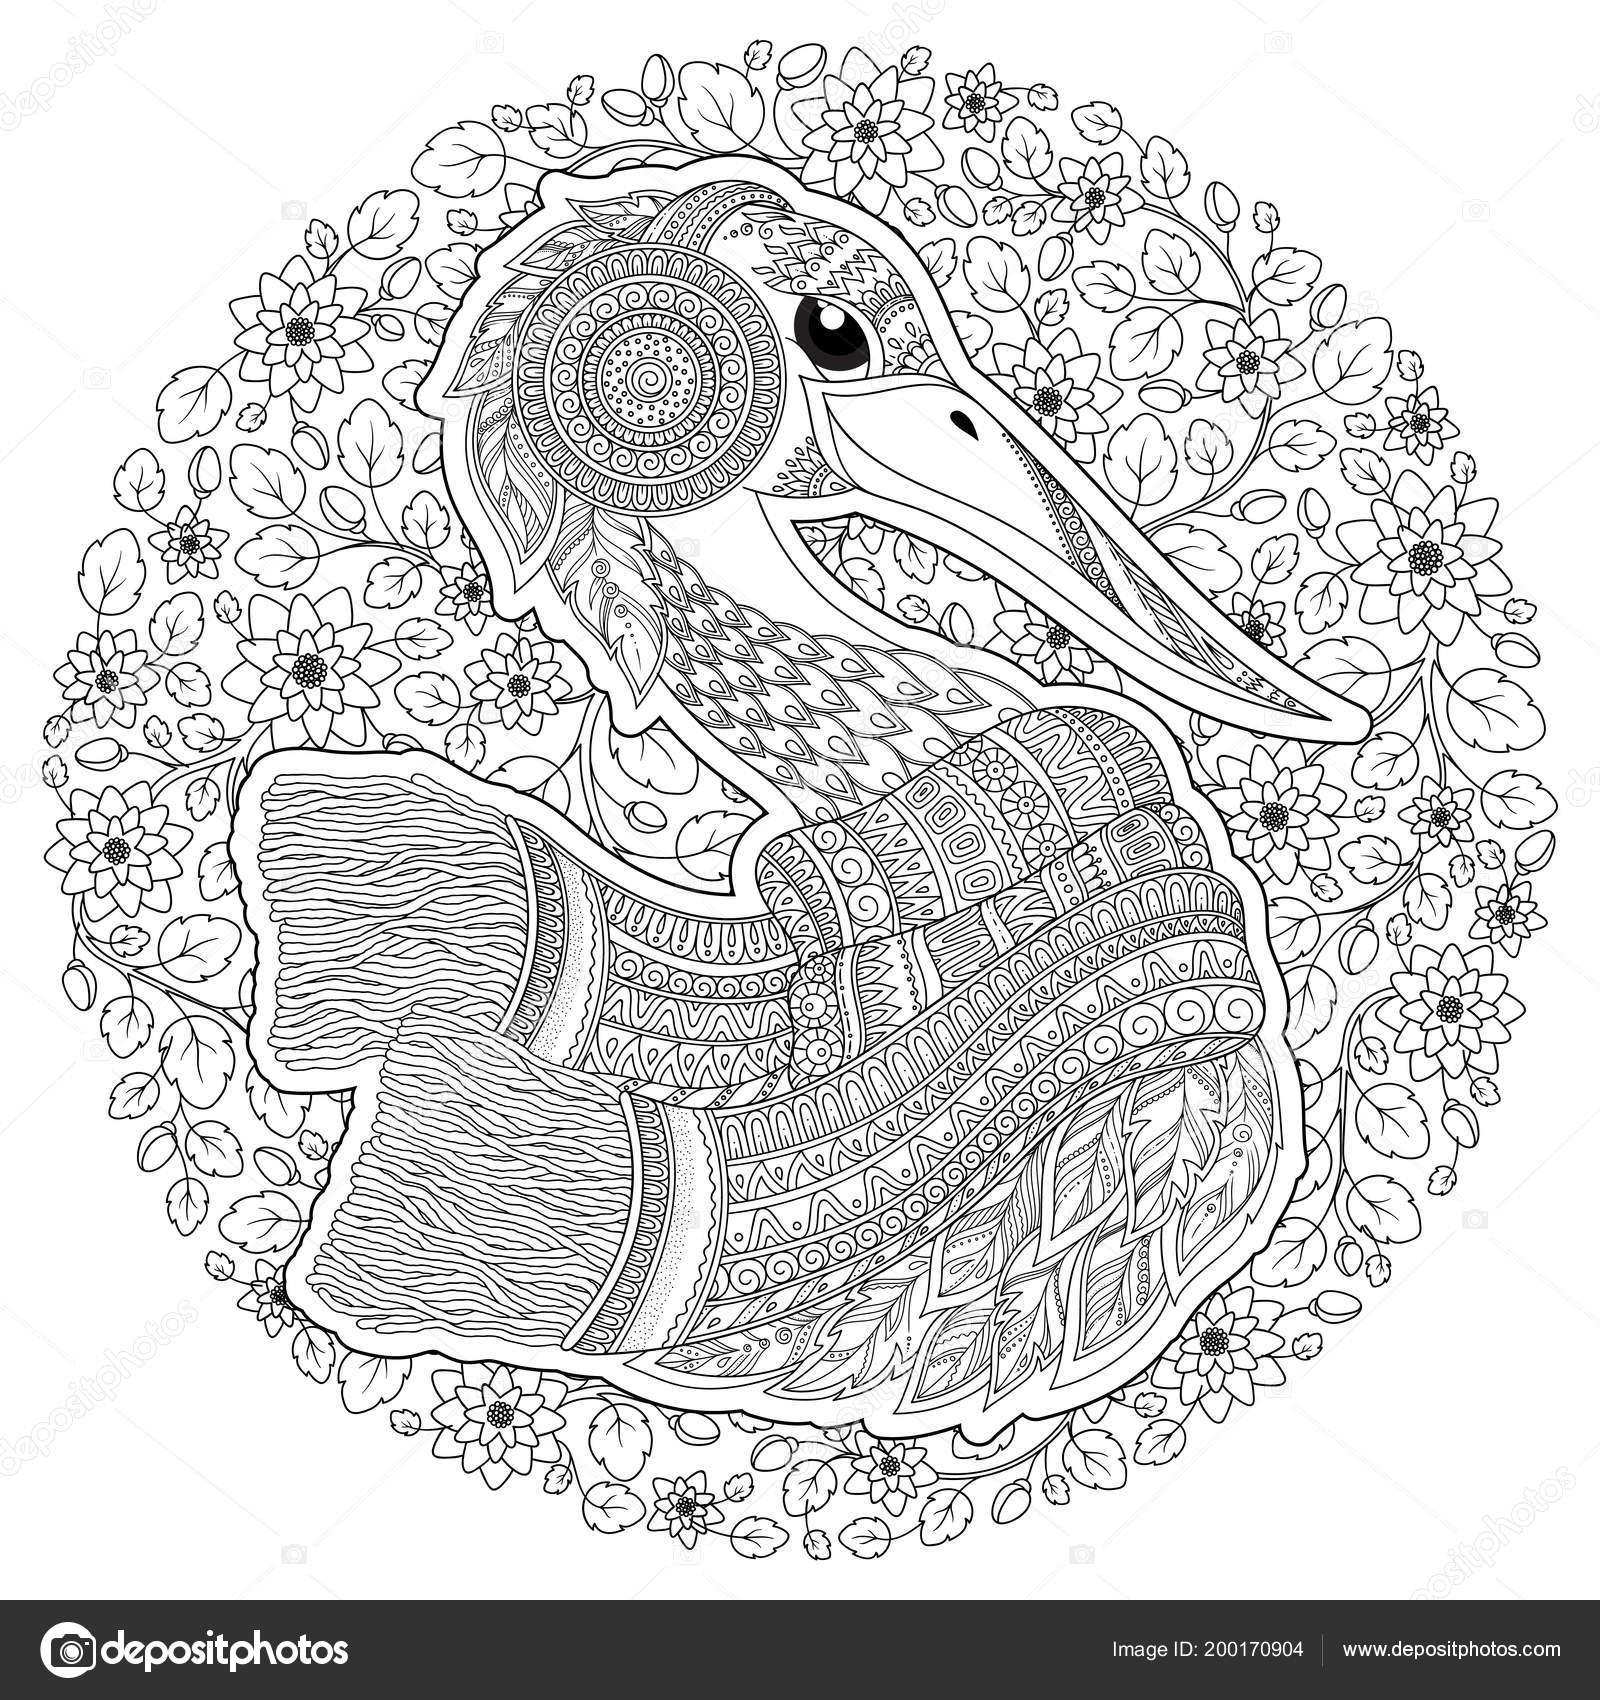 Cigüeña Zentangle Dibujado Mano Para Adultos Estrés Dibujos Para ...